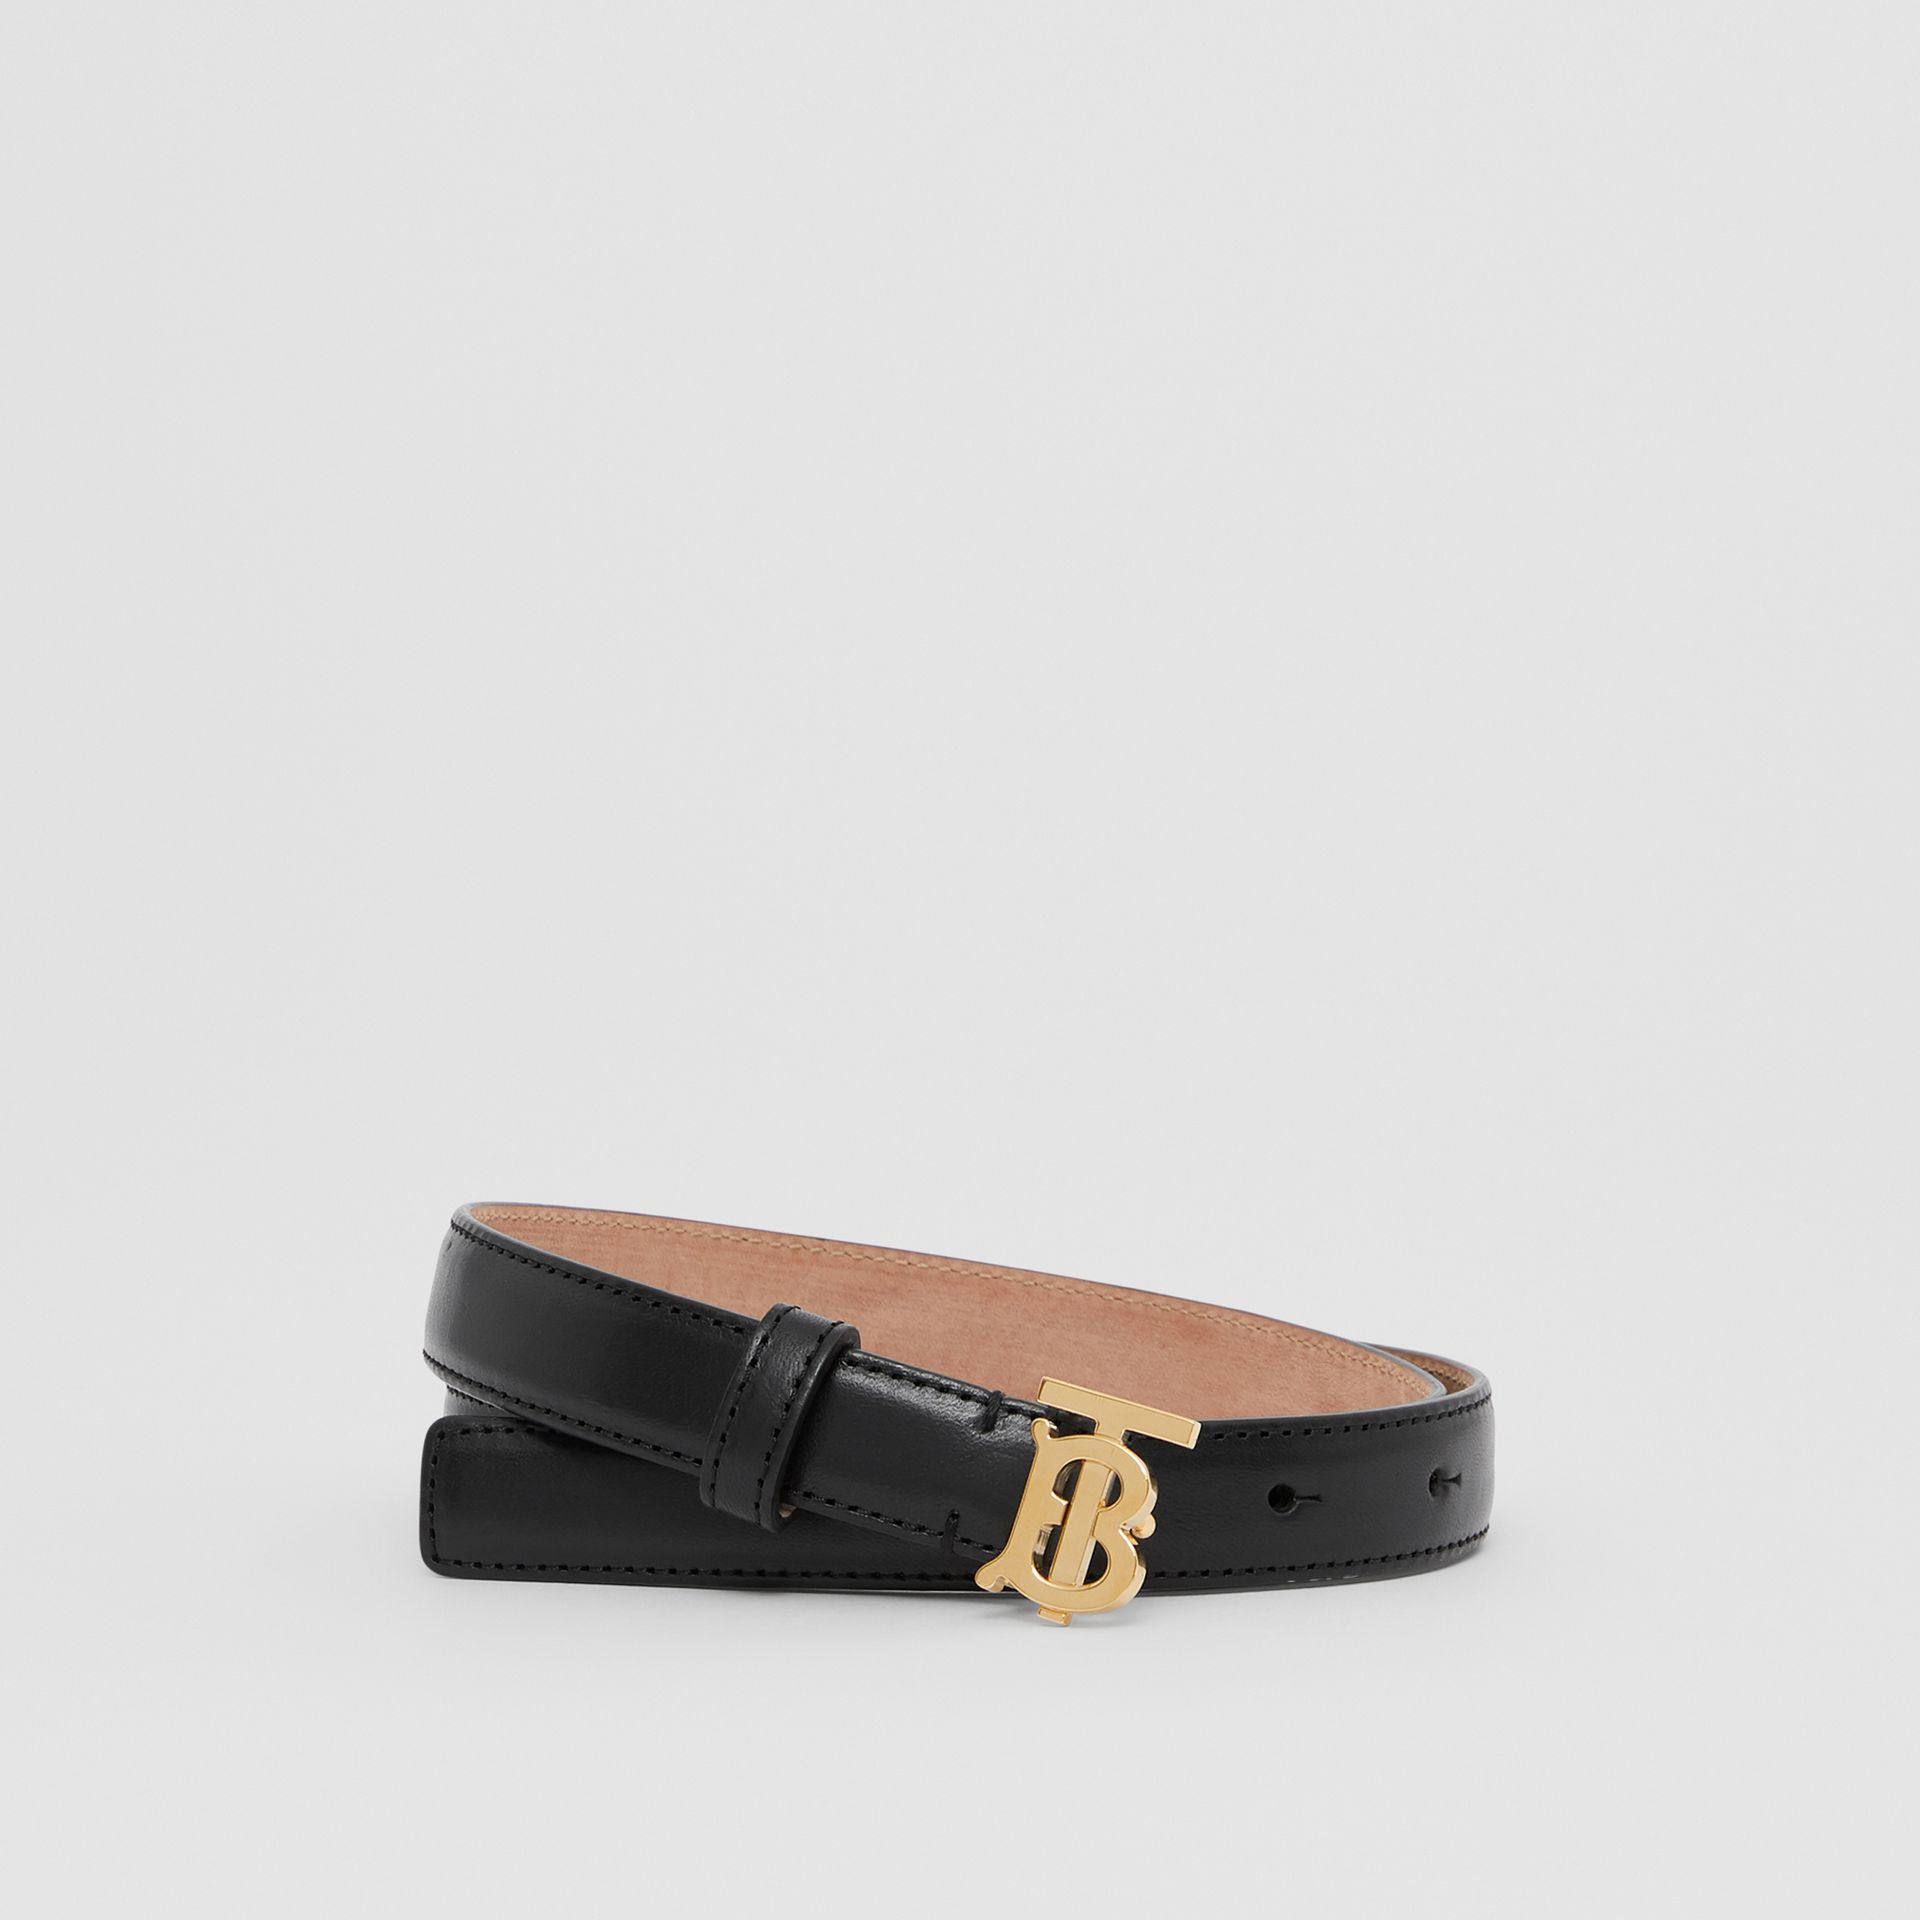 Monogram Motif Leather Belt in Black/light Gold - Women | Burberry United Kingdom - gallery image 0